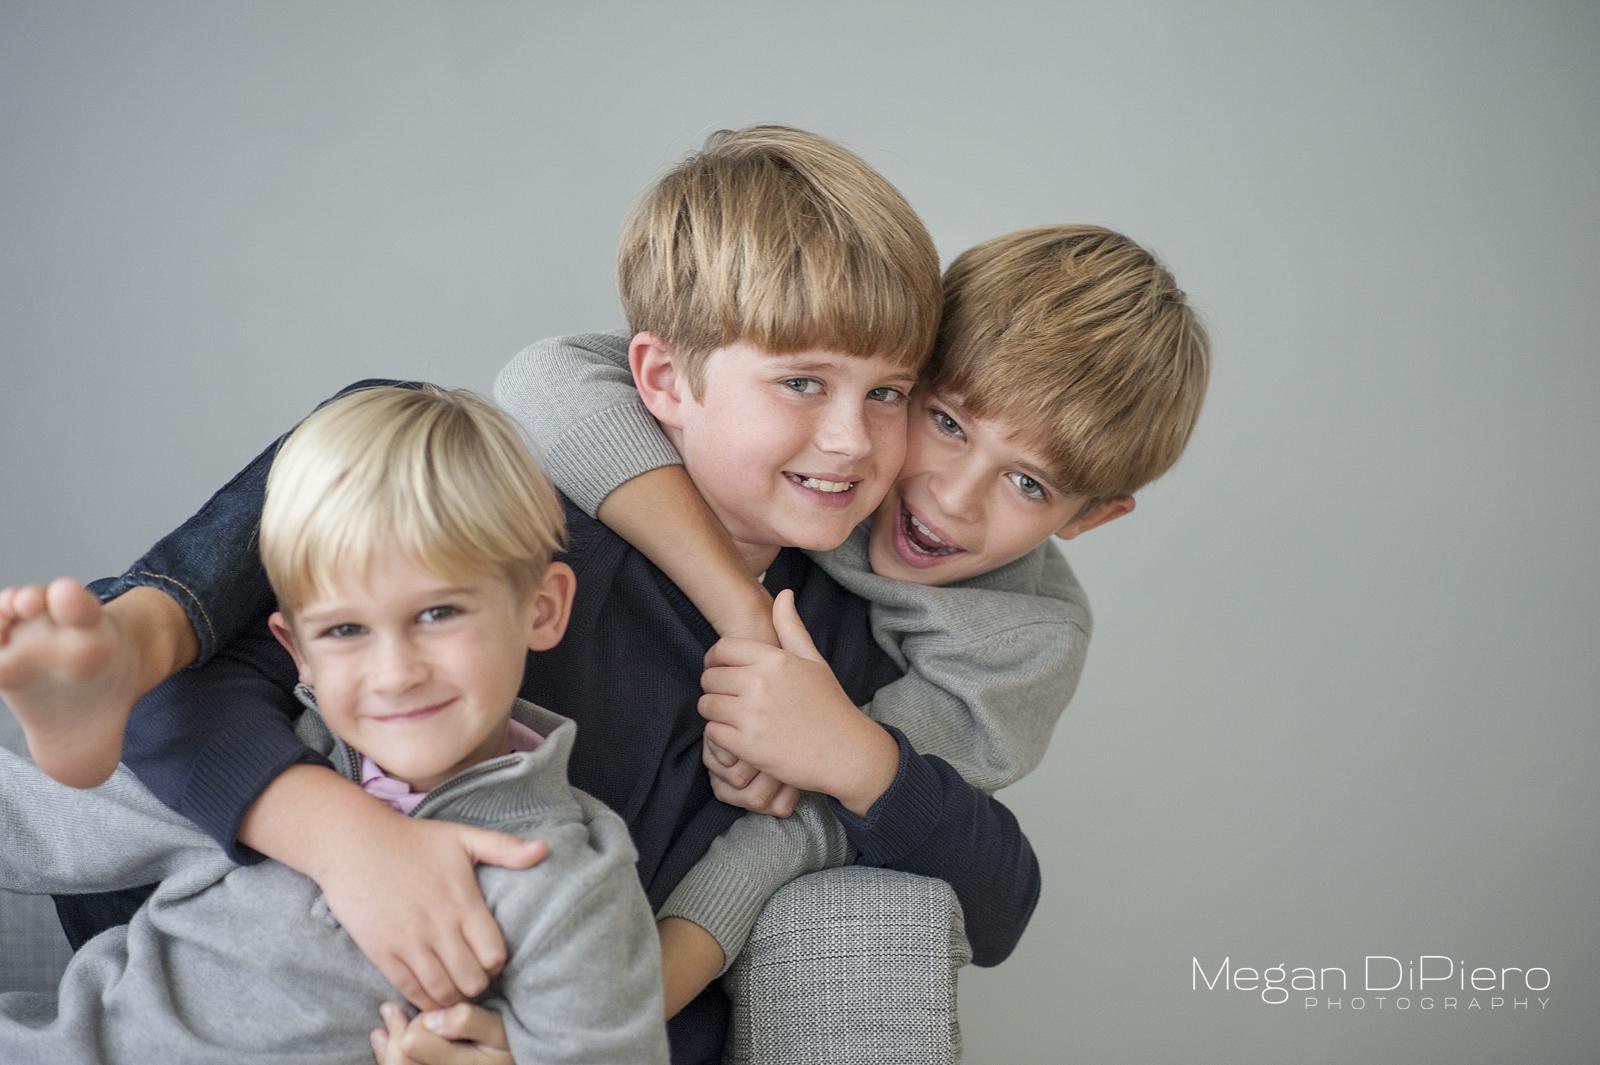 fun-brothers-pose-portrait-1.jpg